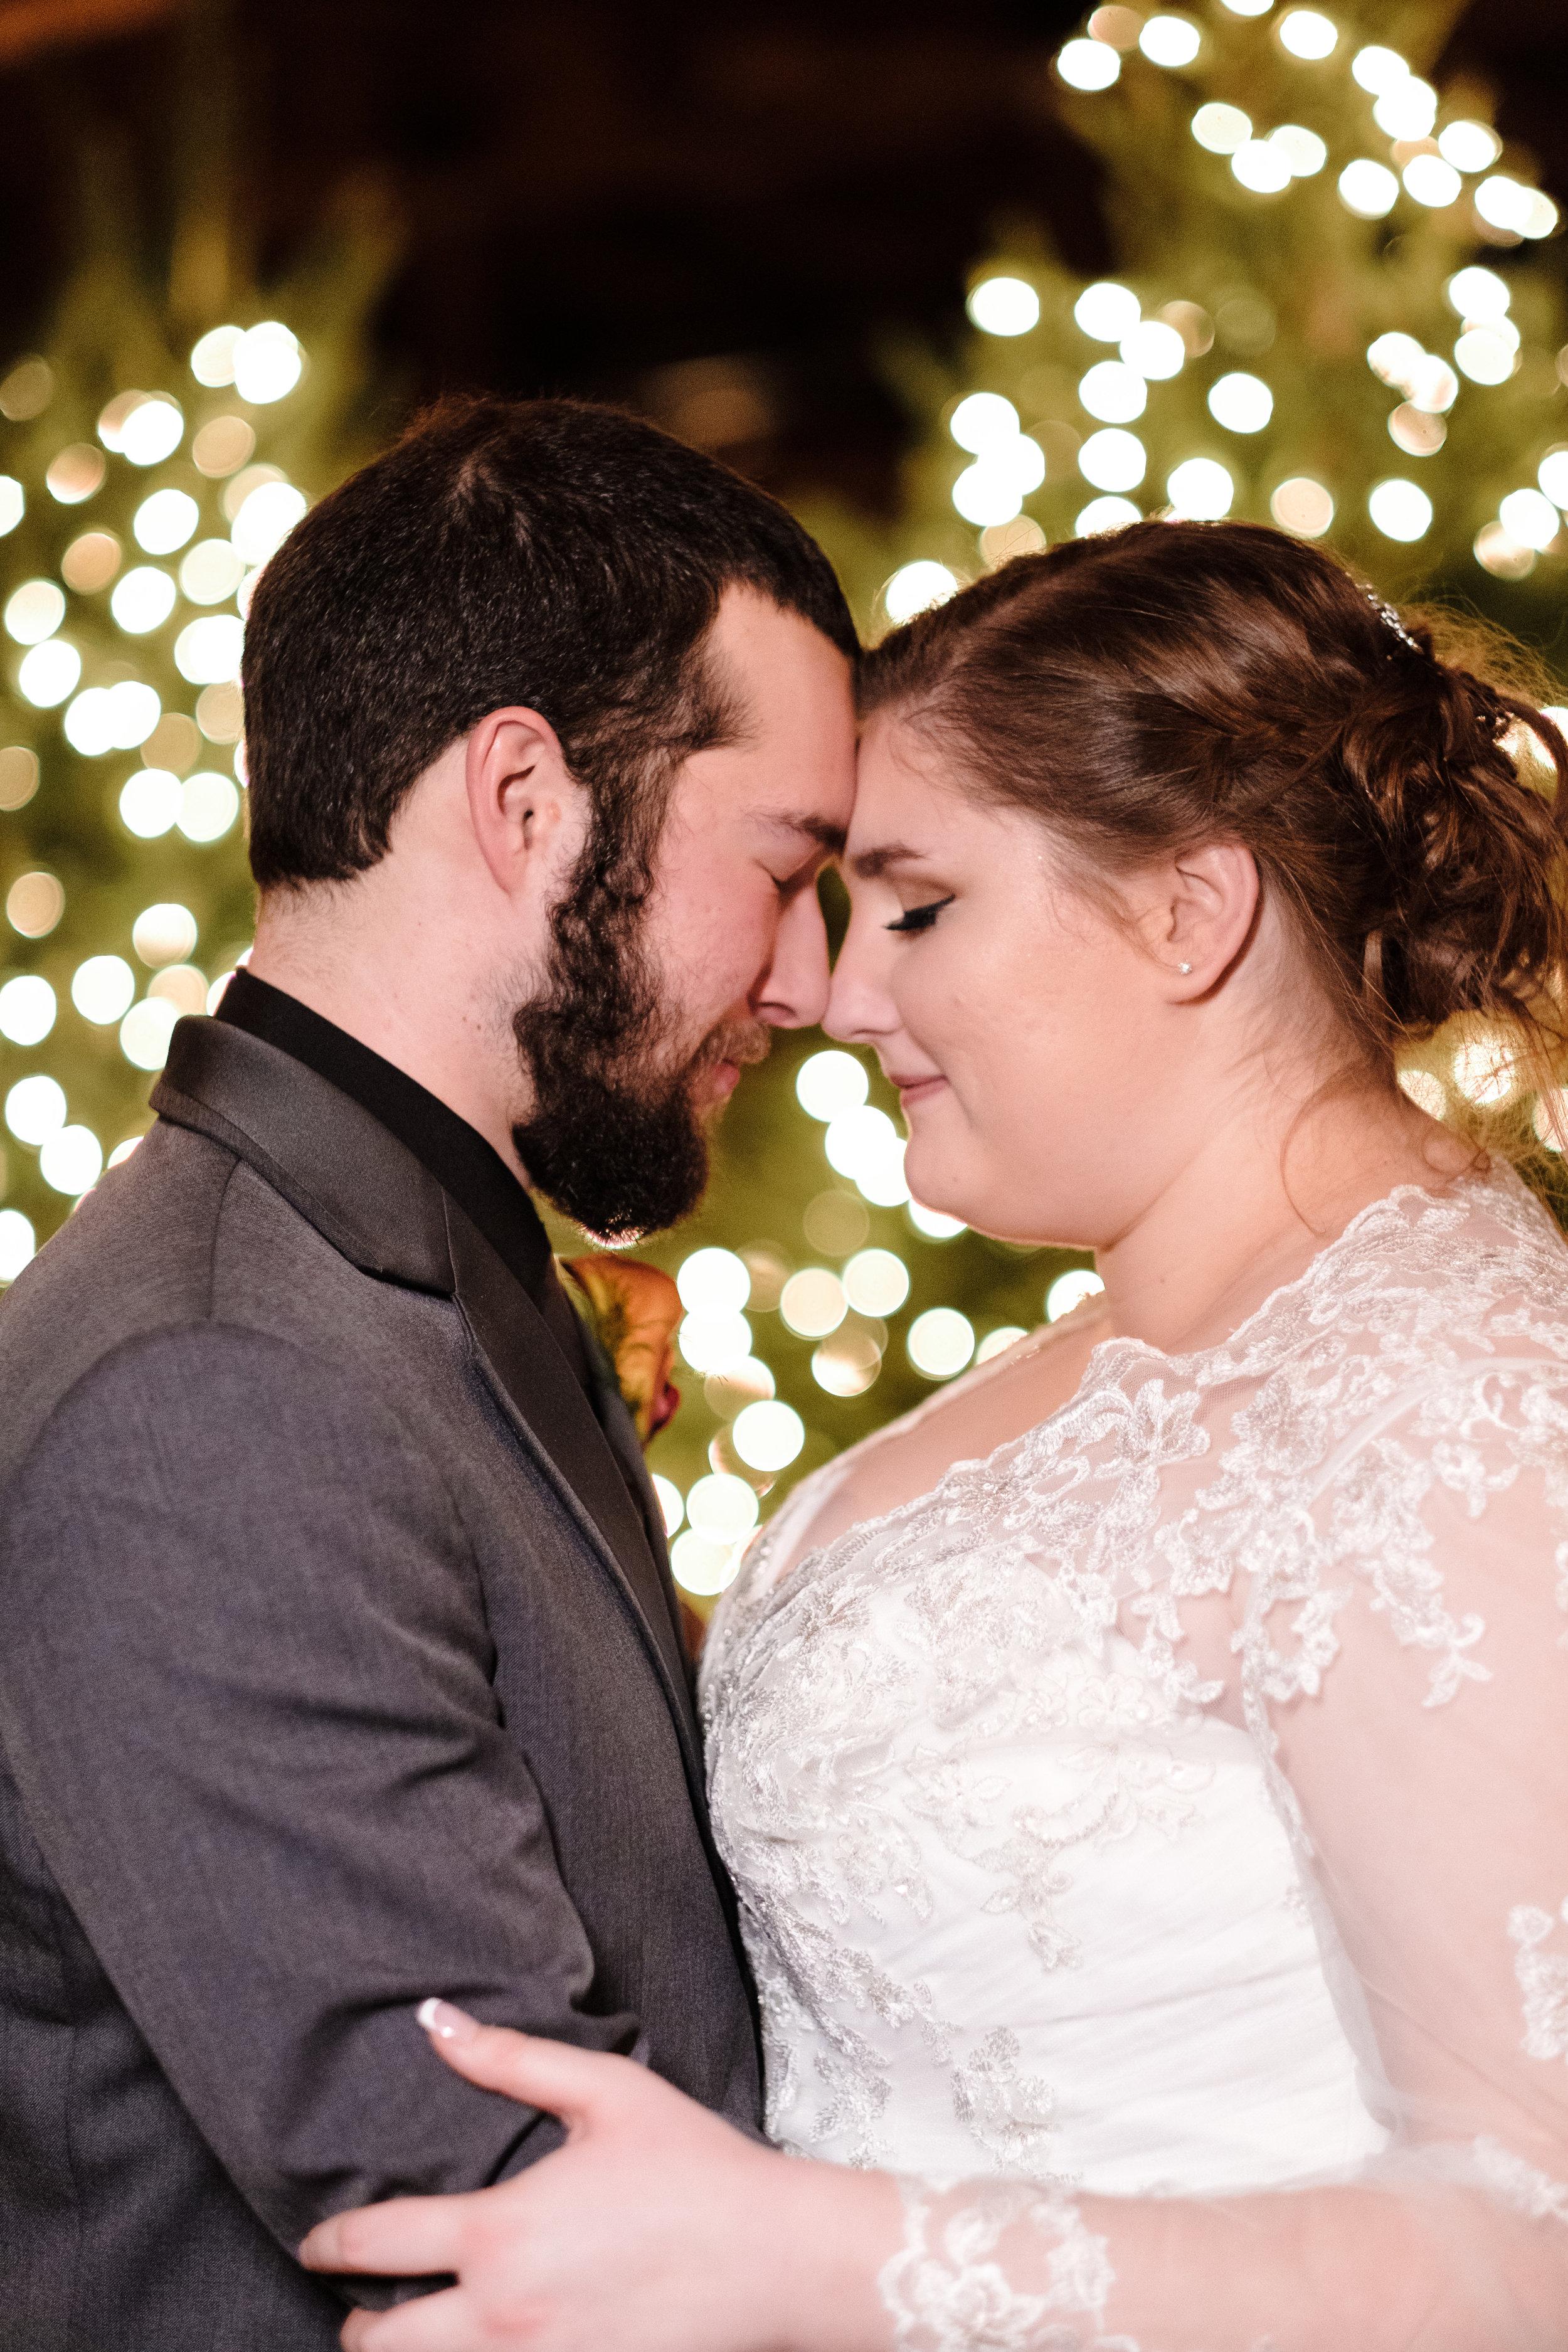 18-12-28 Corinne-Henry-Pavilion-Wedding-511.jpg